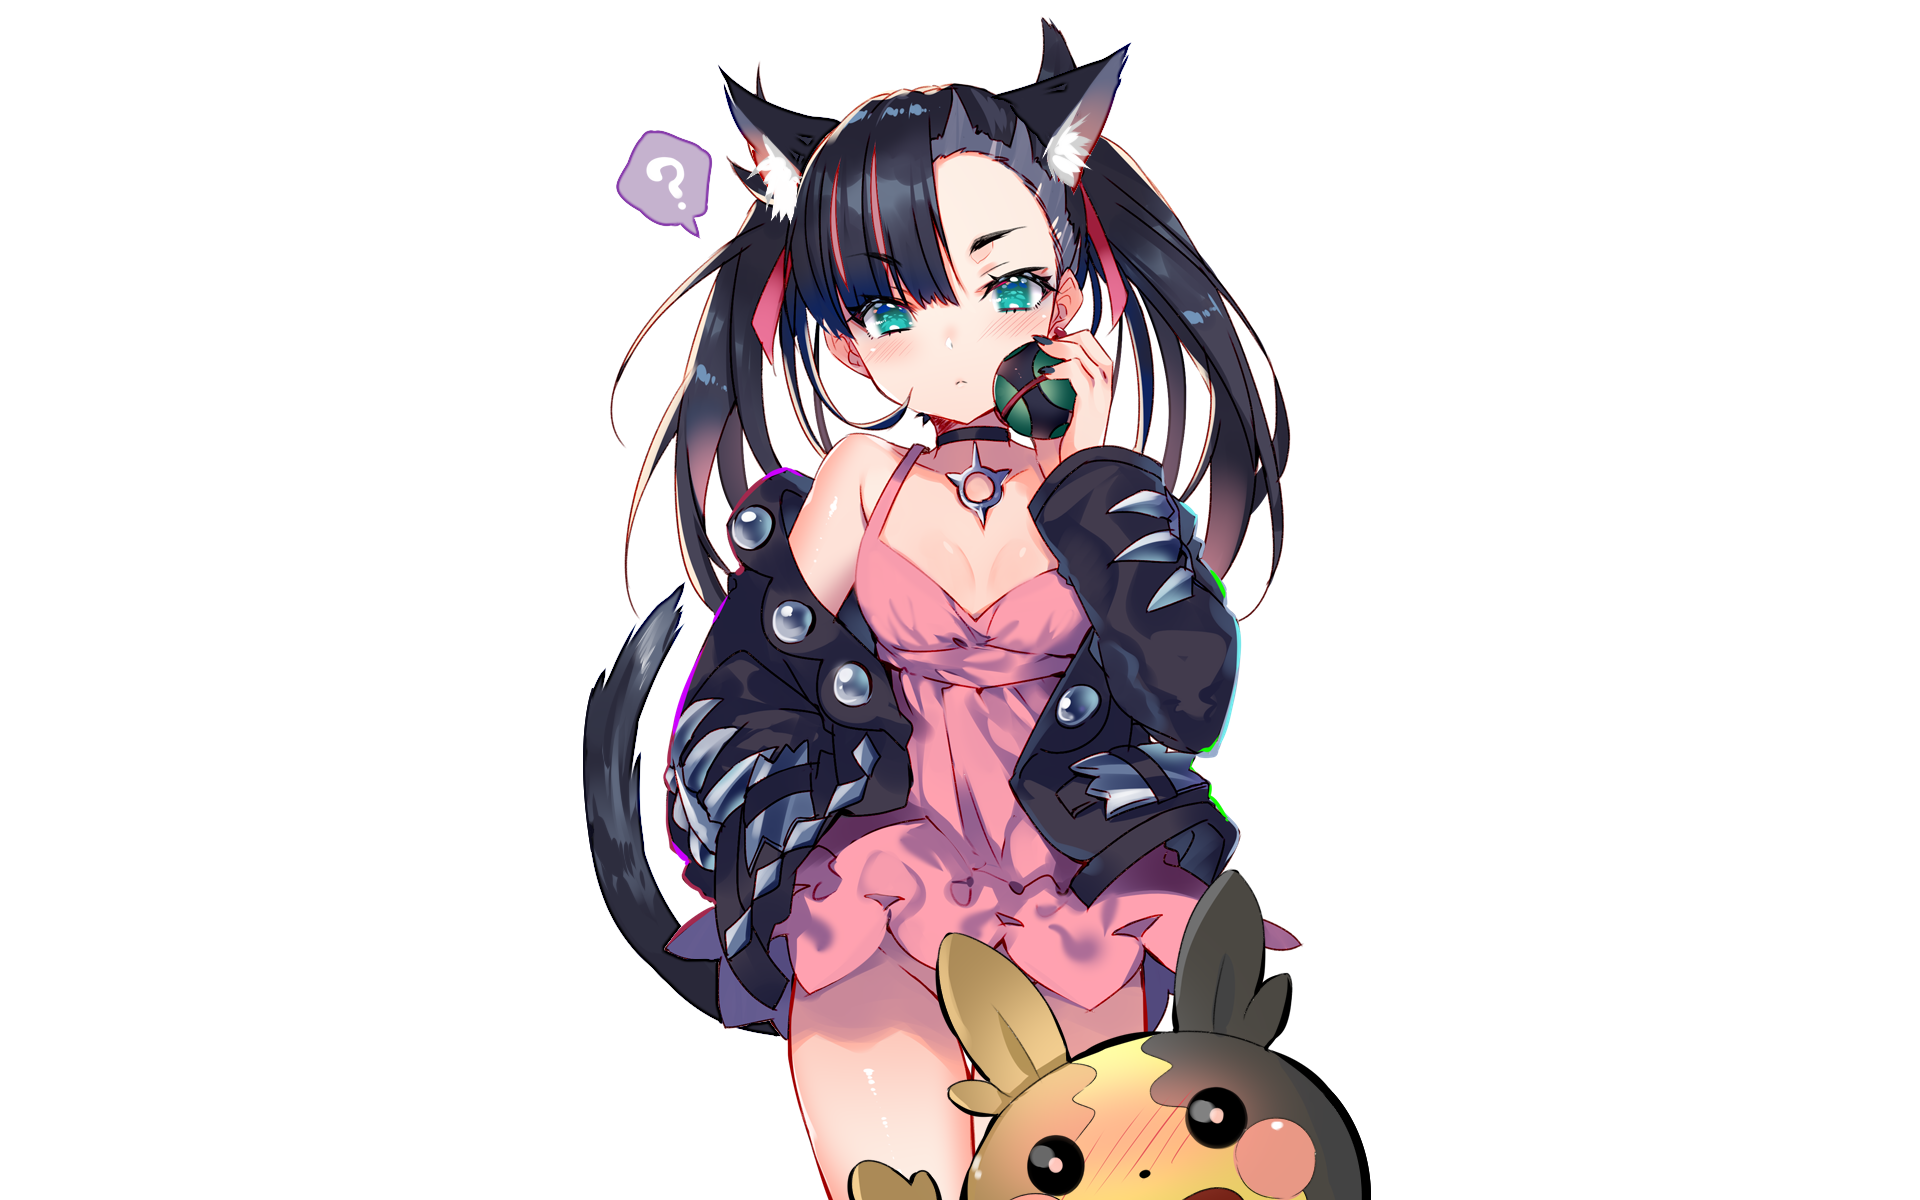 animal ears blush brown hair catgirl dress kotoba noriaki